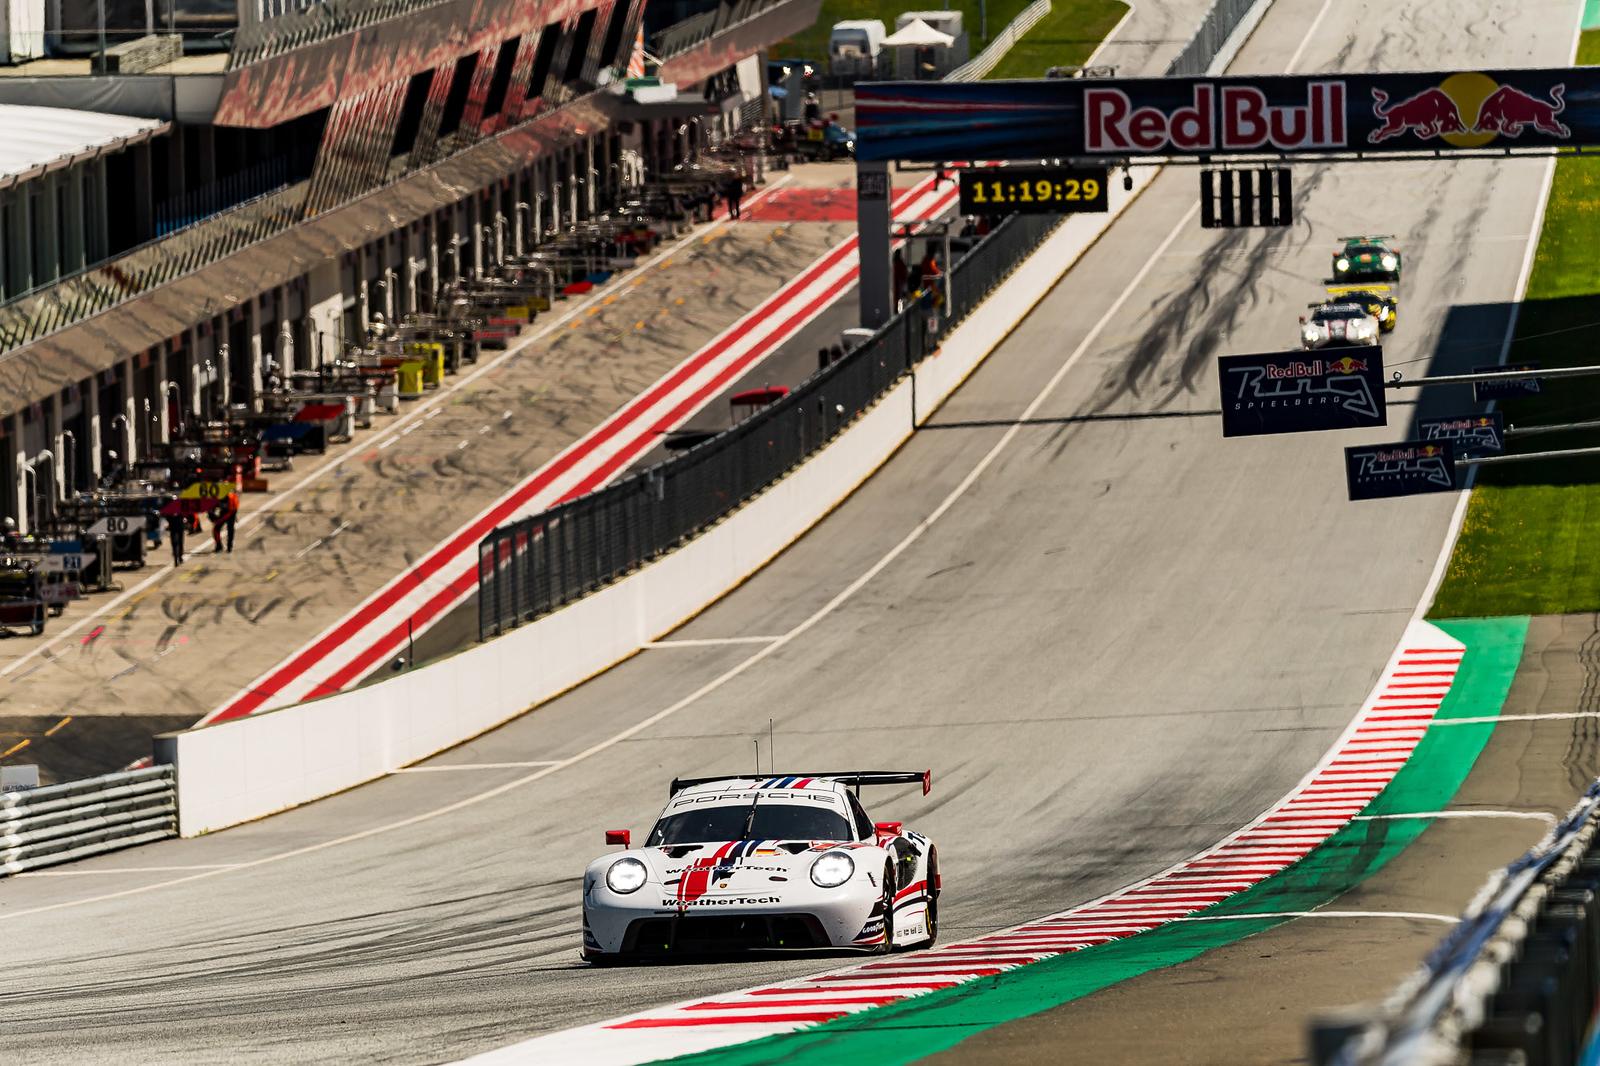 Porsche at the starting line.